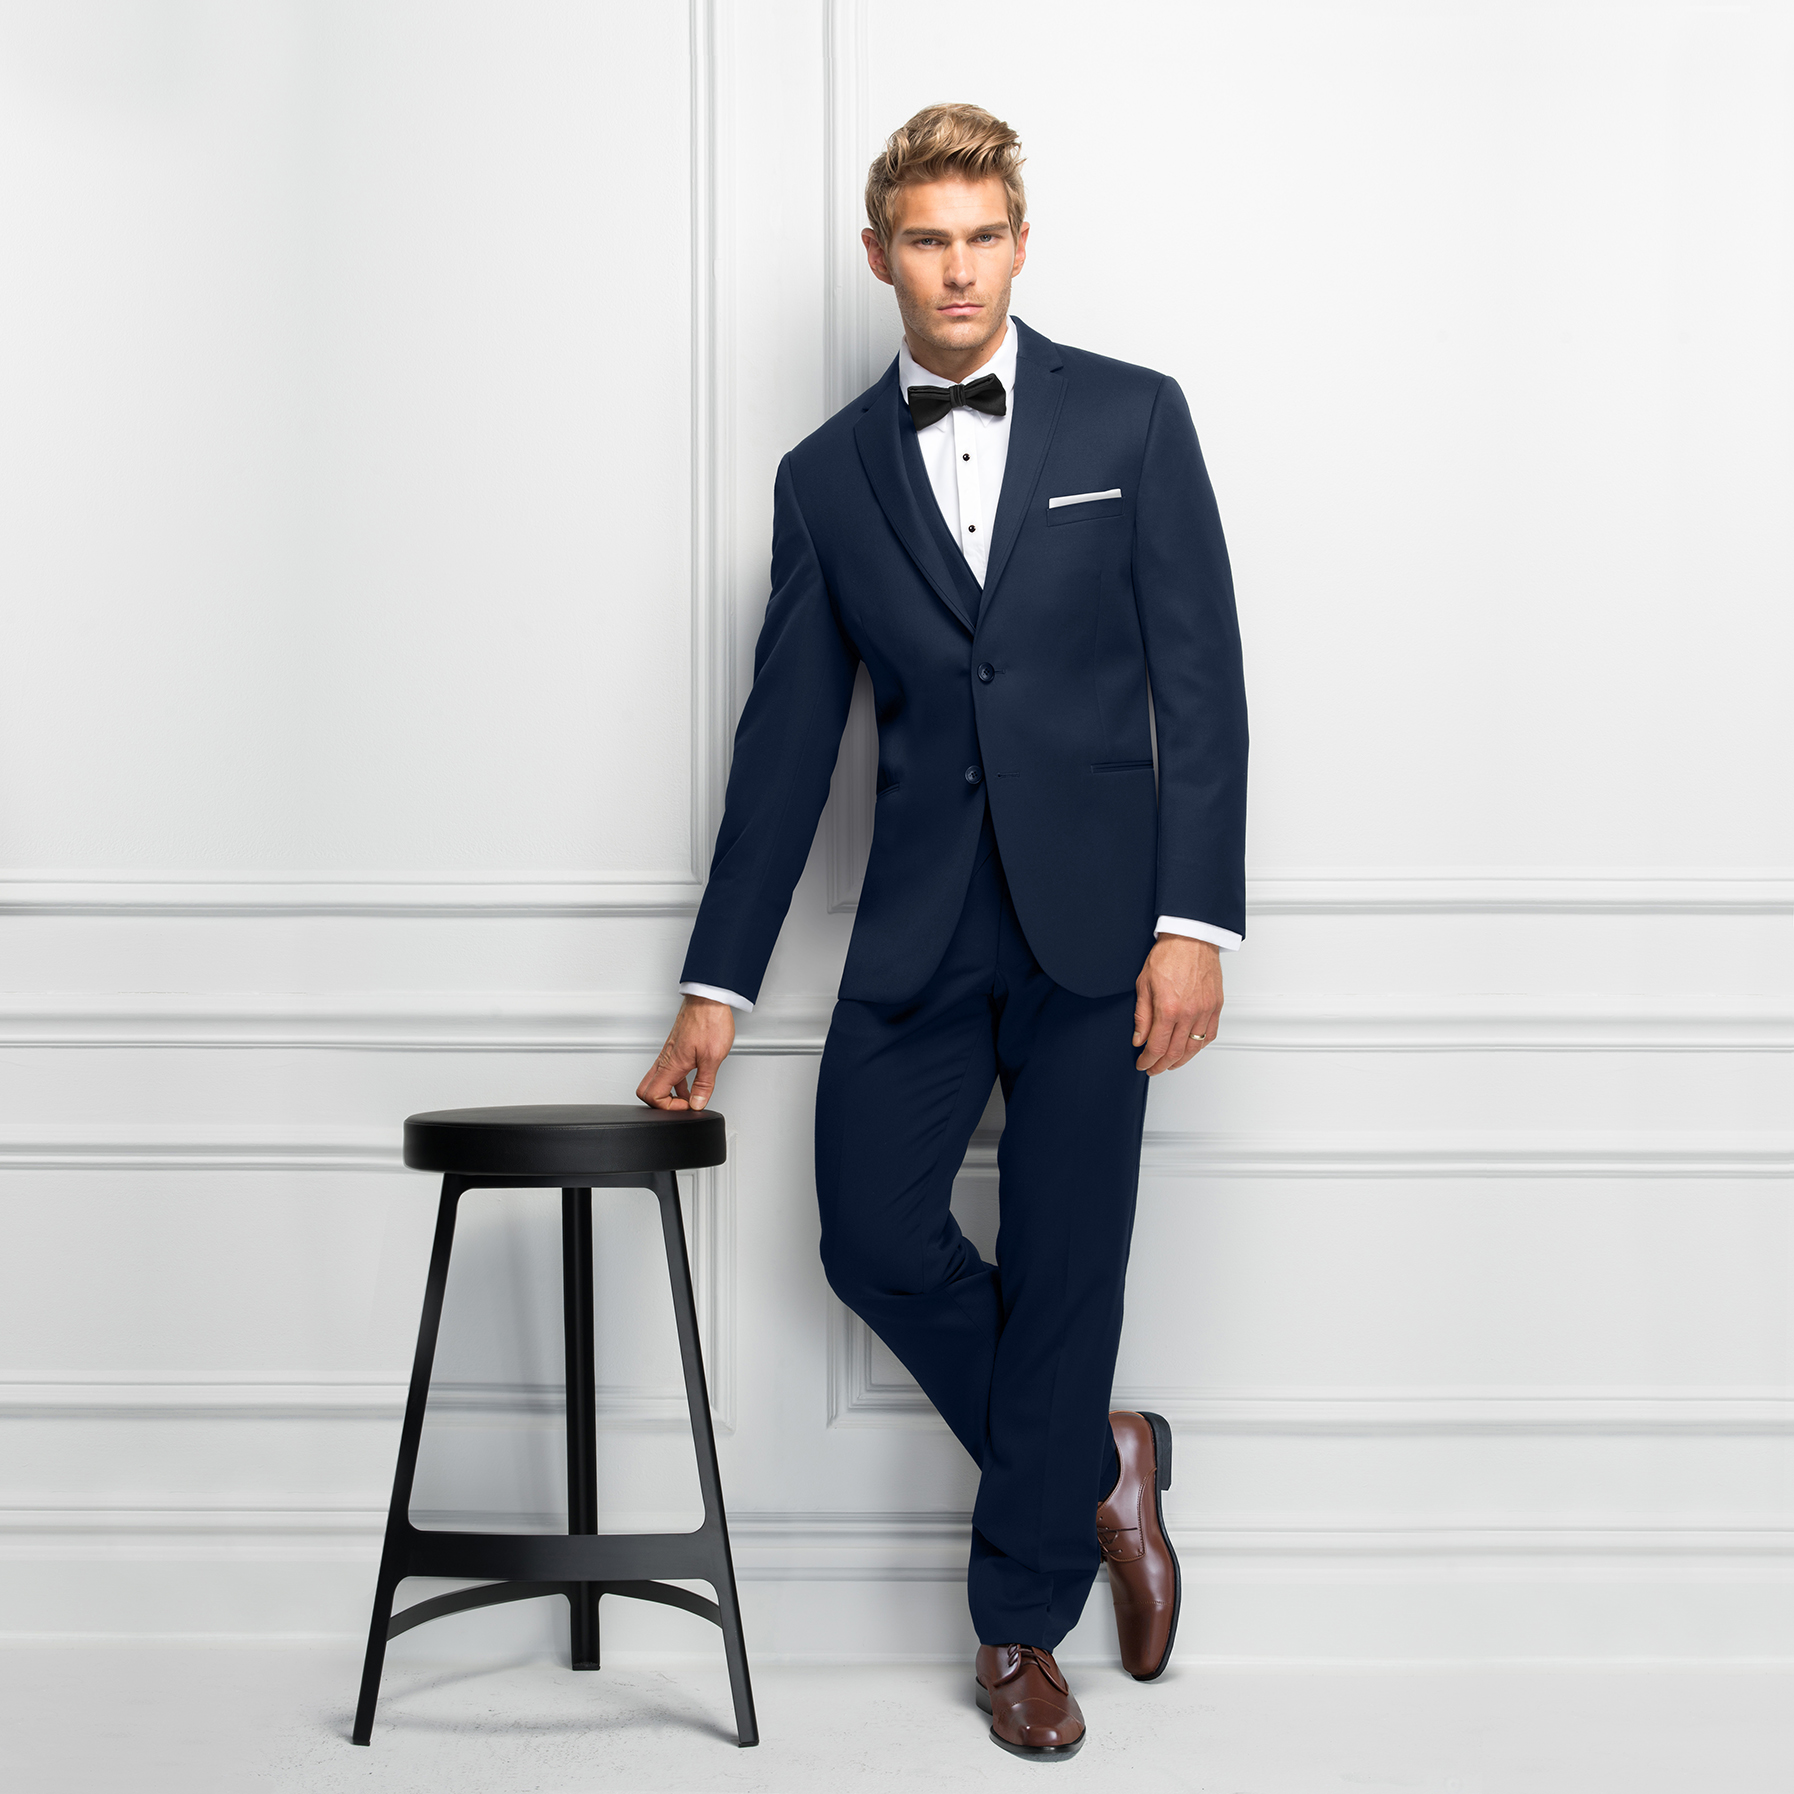 Michael Kors Ultra Slim Navy Sterling   Bridal and Formalwear by Jakdrs